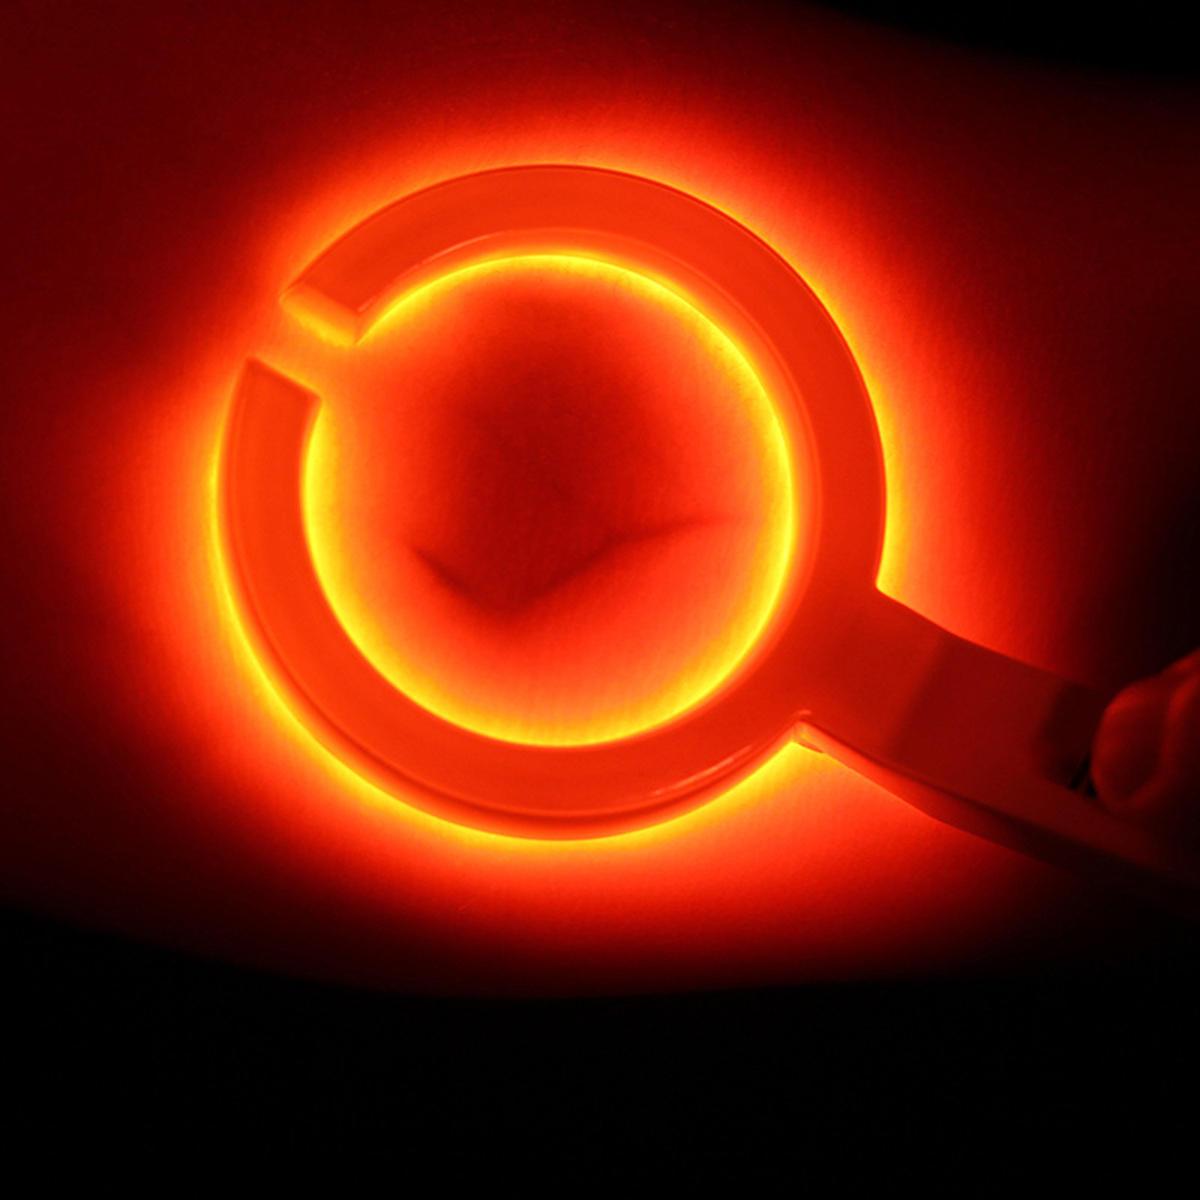 Proiettore di vena a raggi infrarossi palmare Viewer Vein Locator Rilevatore di illuminazione Proiezione di luce